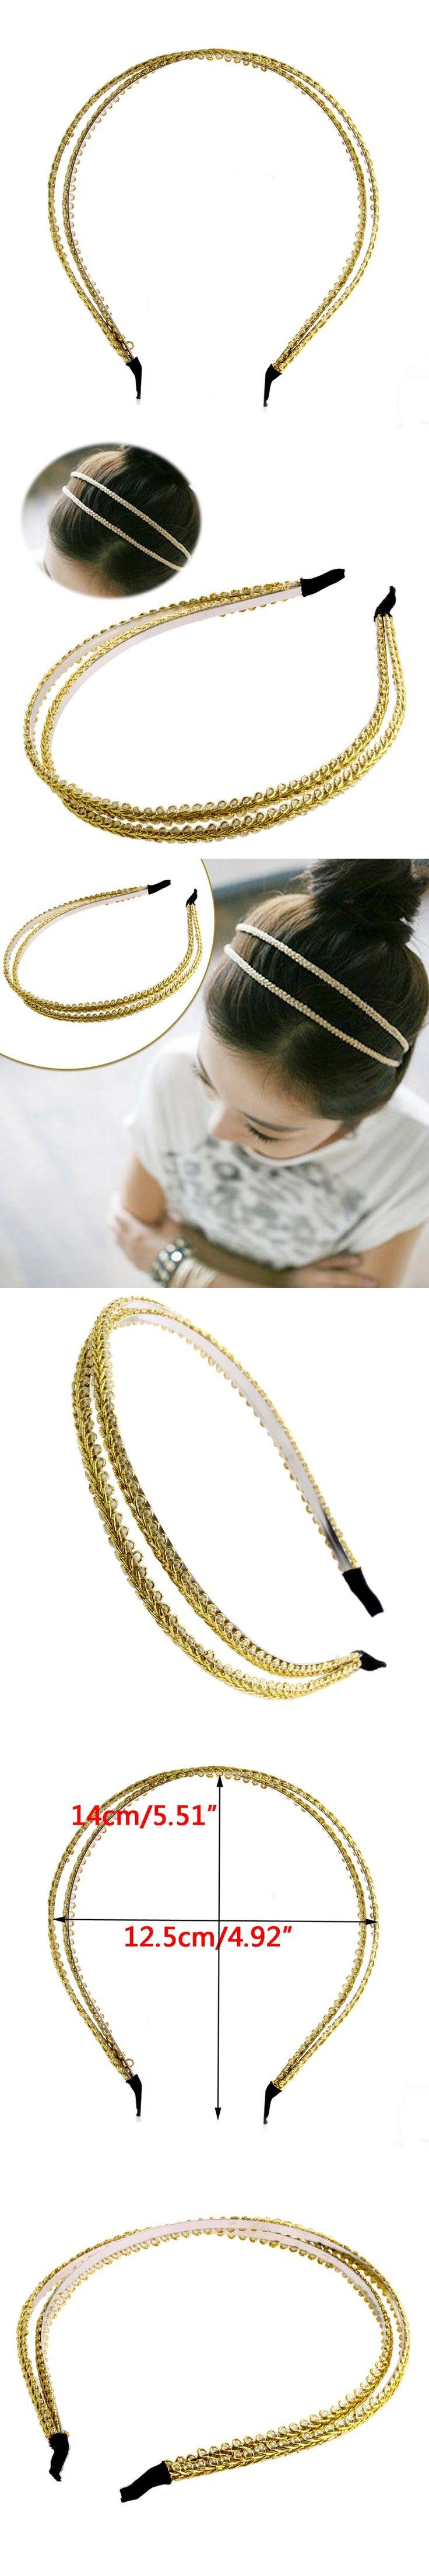 Kemei Womens Fashion Double Chain Jewelry Metal Headband Hair Hoop Headpiece Hair Band